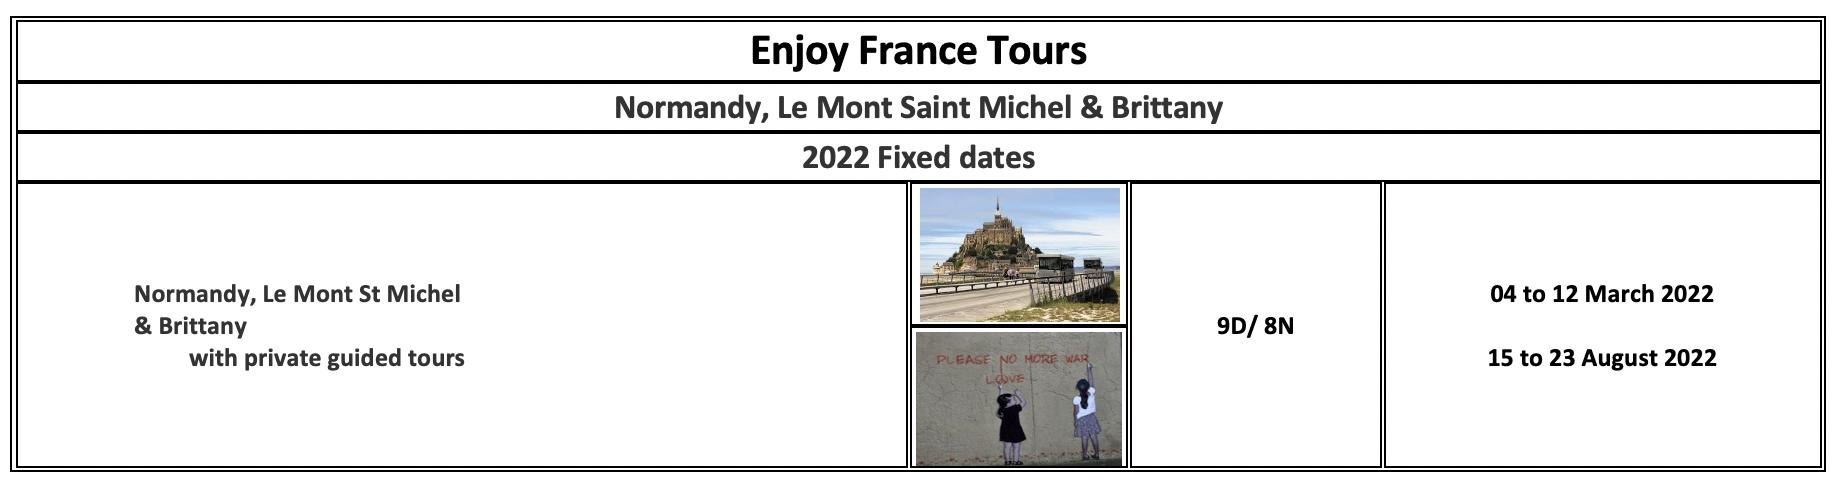 Enjoy France Tours 2022 Normandy